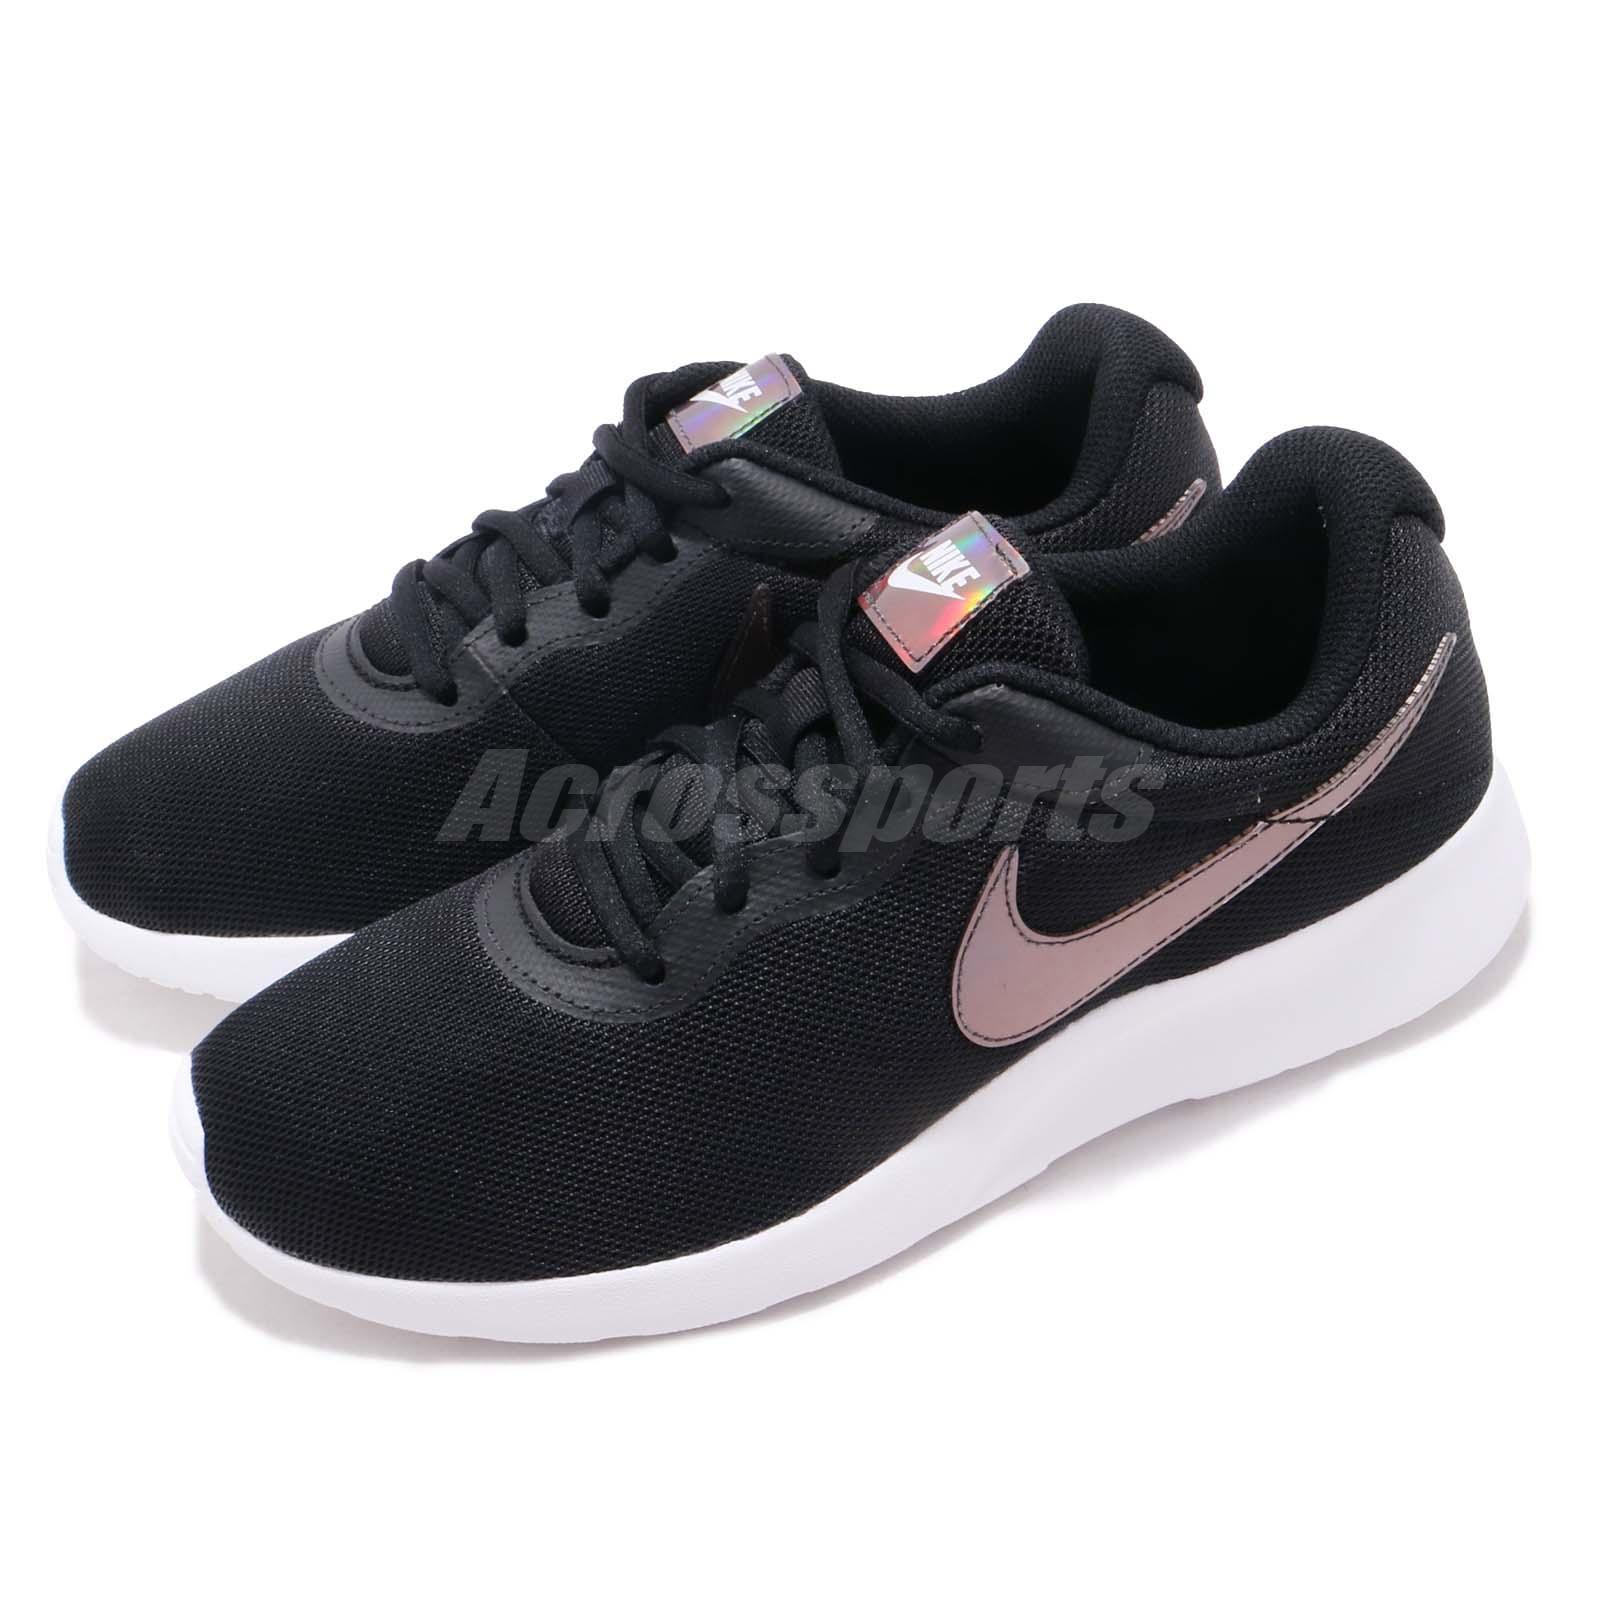 Nike Femme Tanjun Running Trainers 812655 Sneakers Chaussures 006